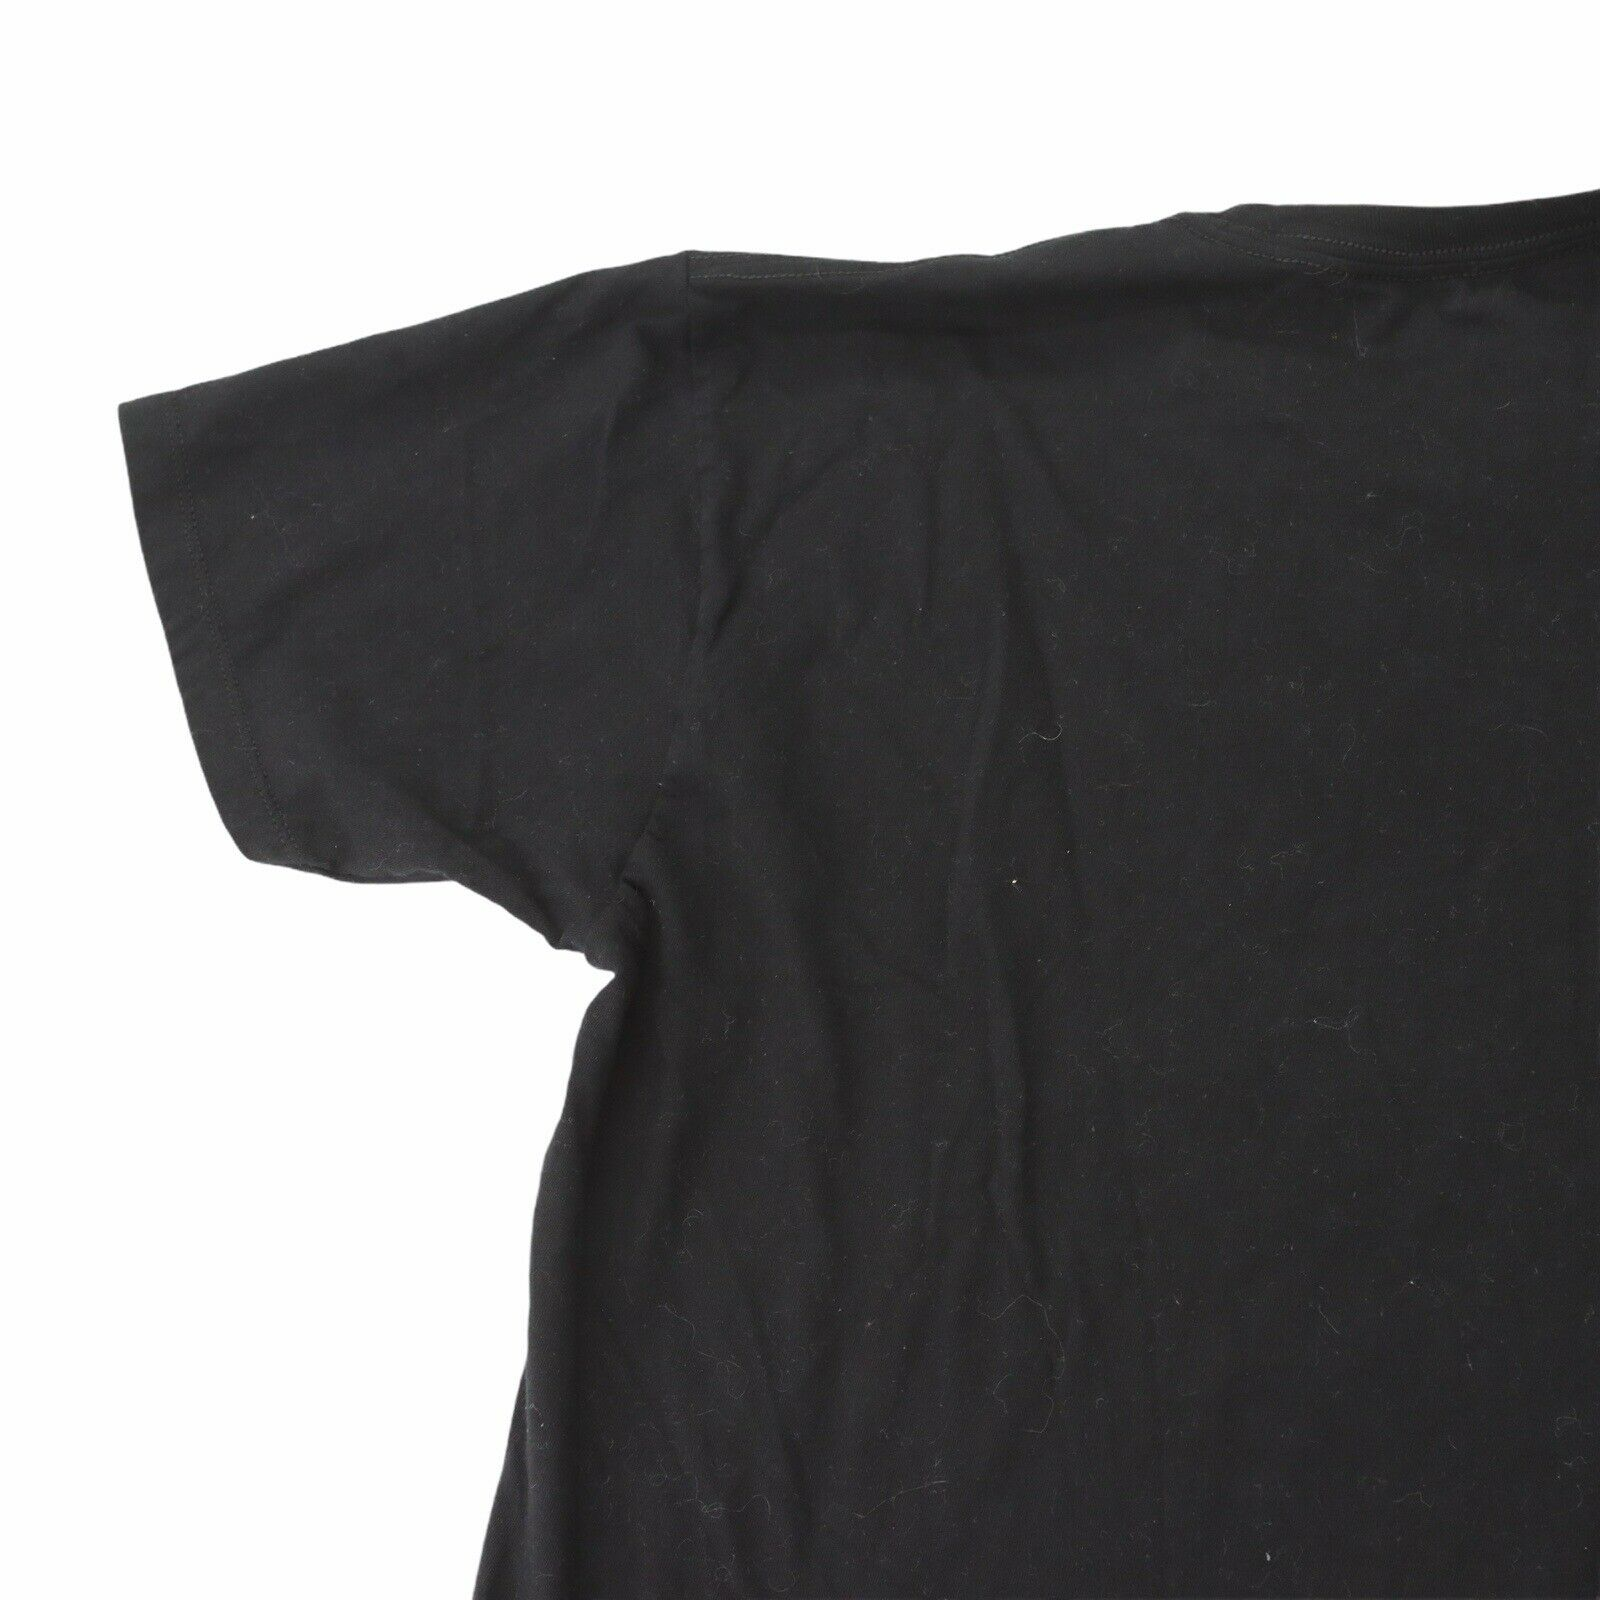 Britney Spears Shirt - It's Britney, Bitch! Rare … - image 9